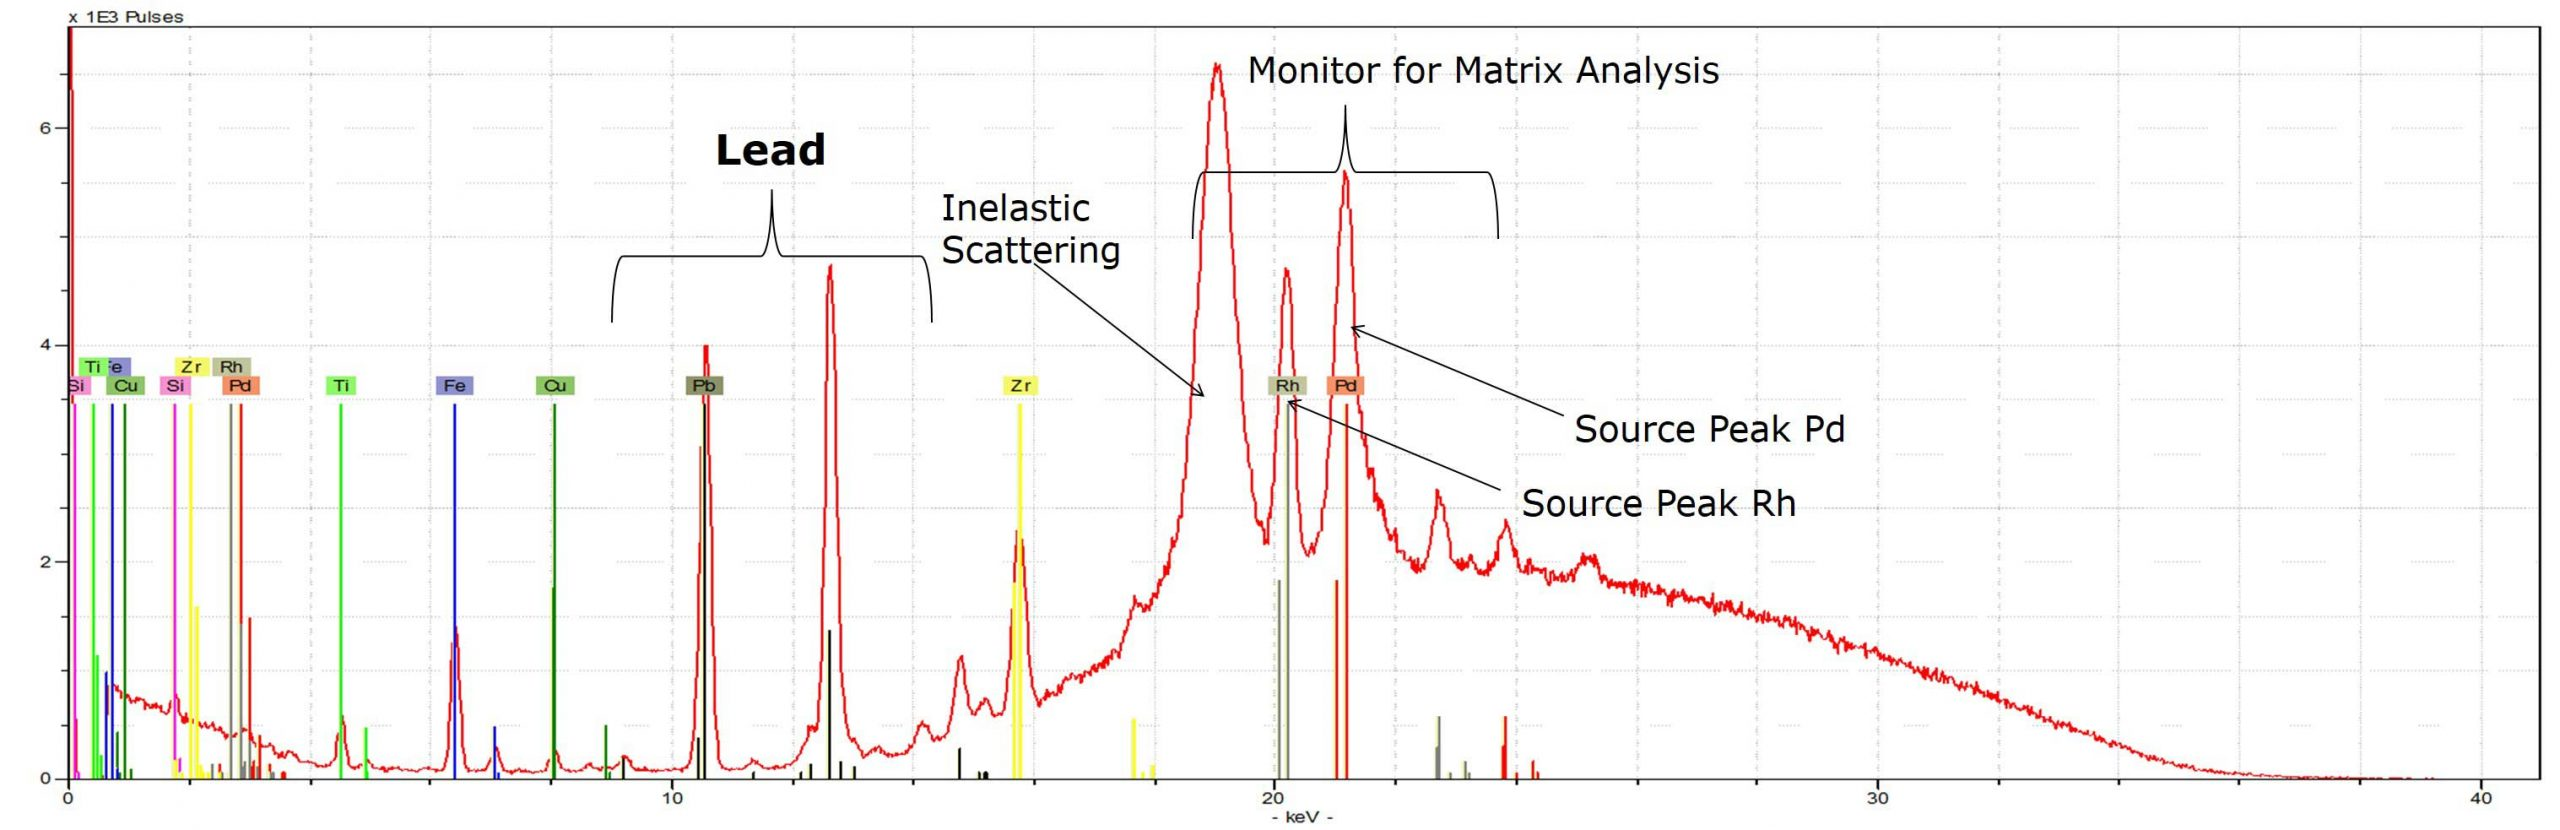 Monitor of Matrix Analysis